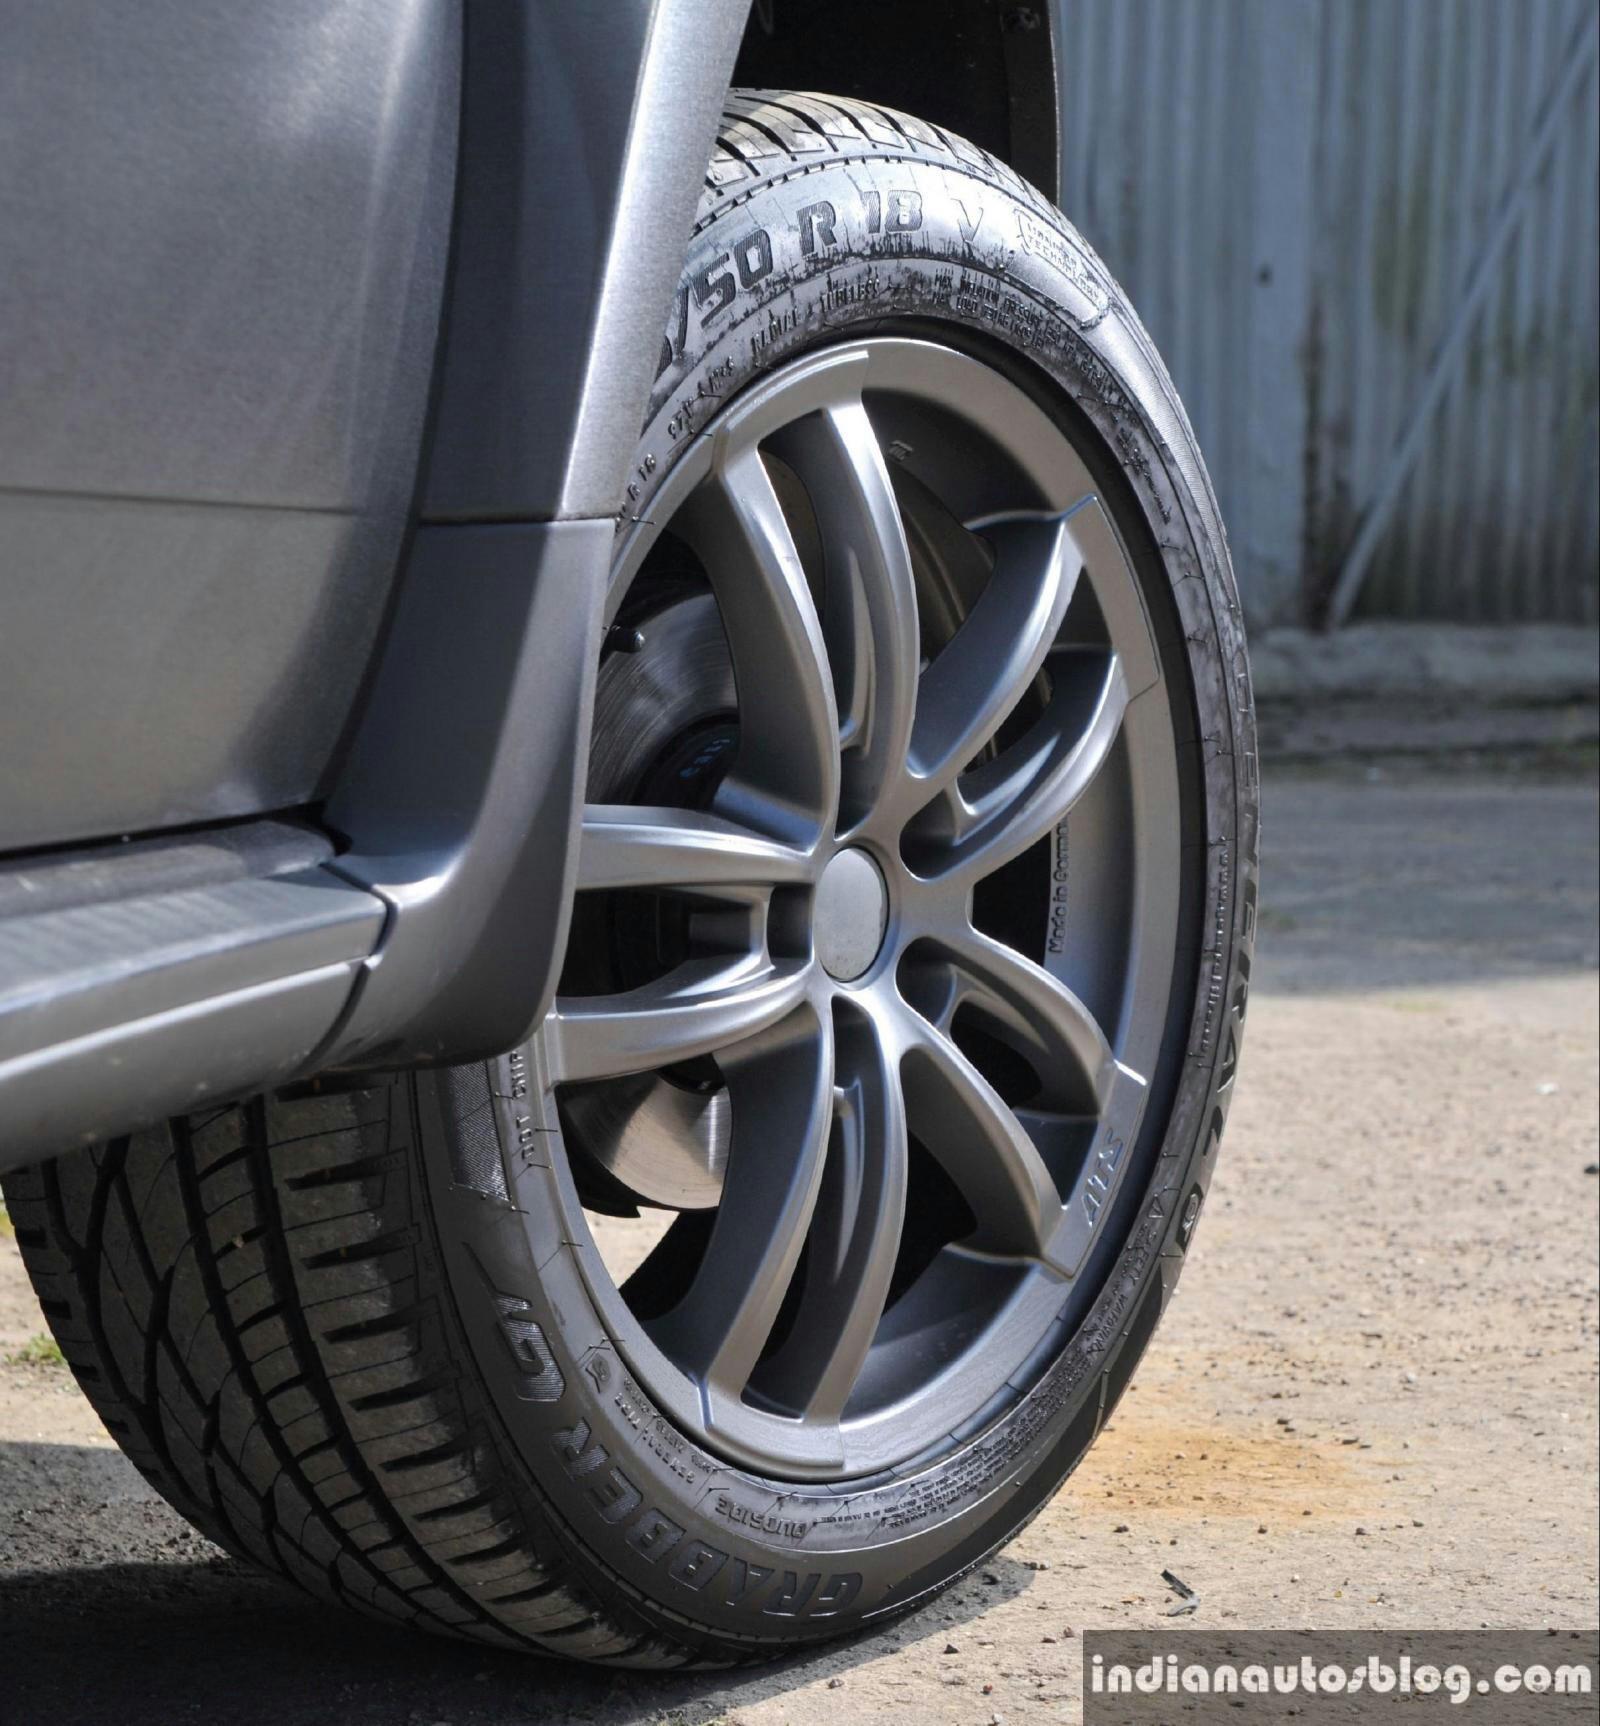 Renault Dacia Duster Black Edition 18-inch alloy wheels